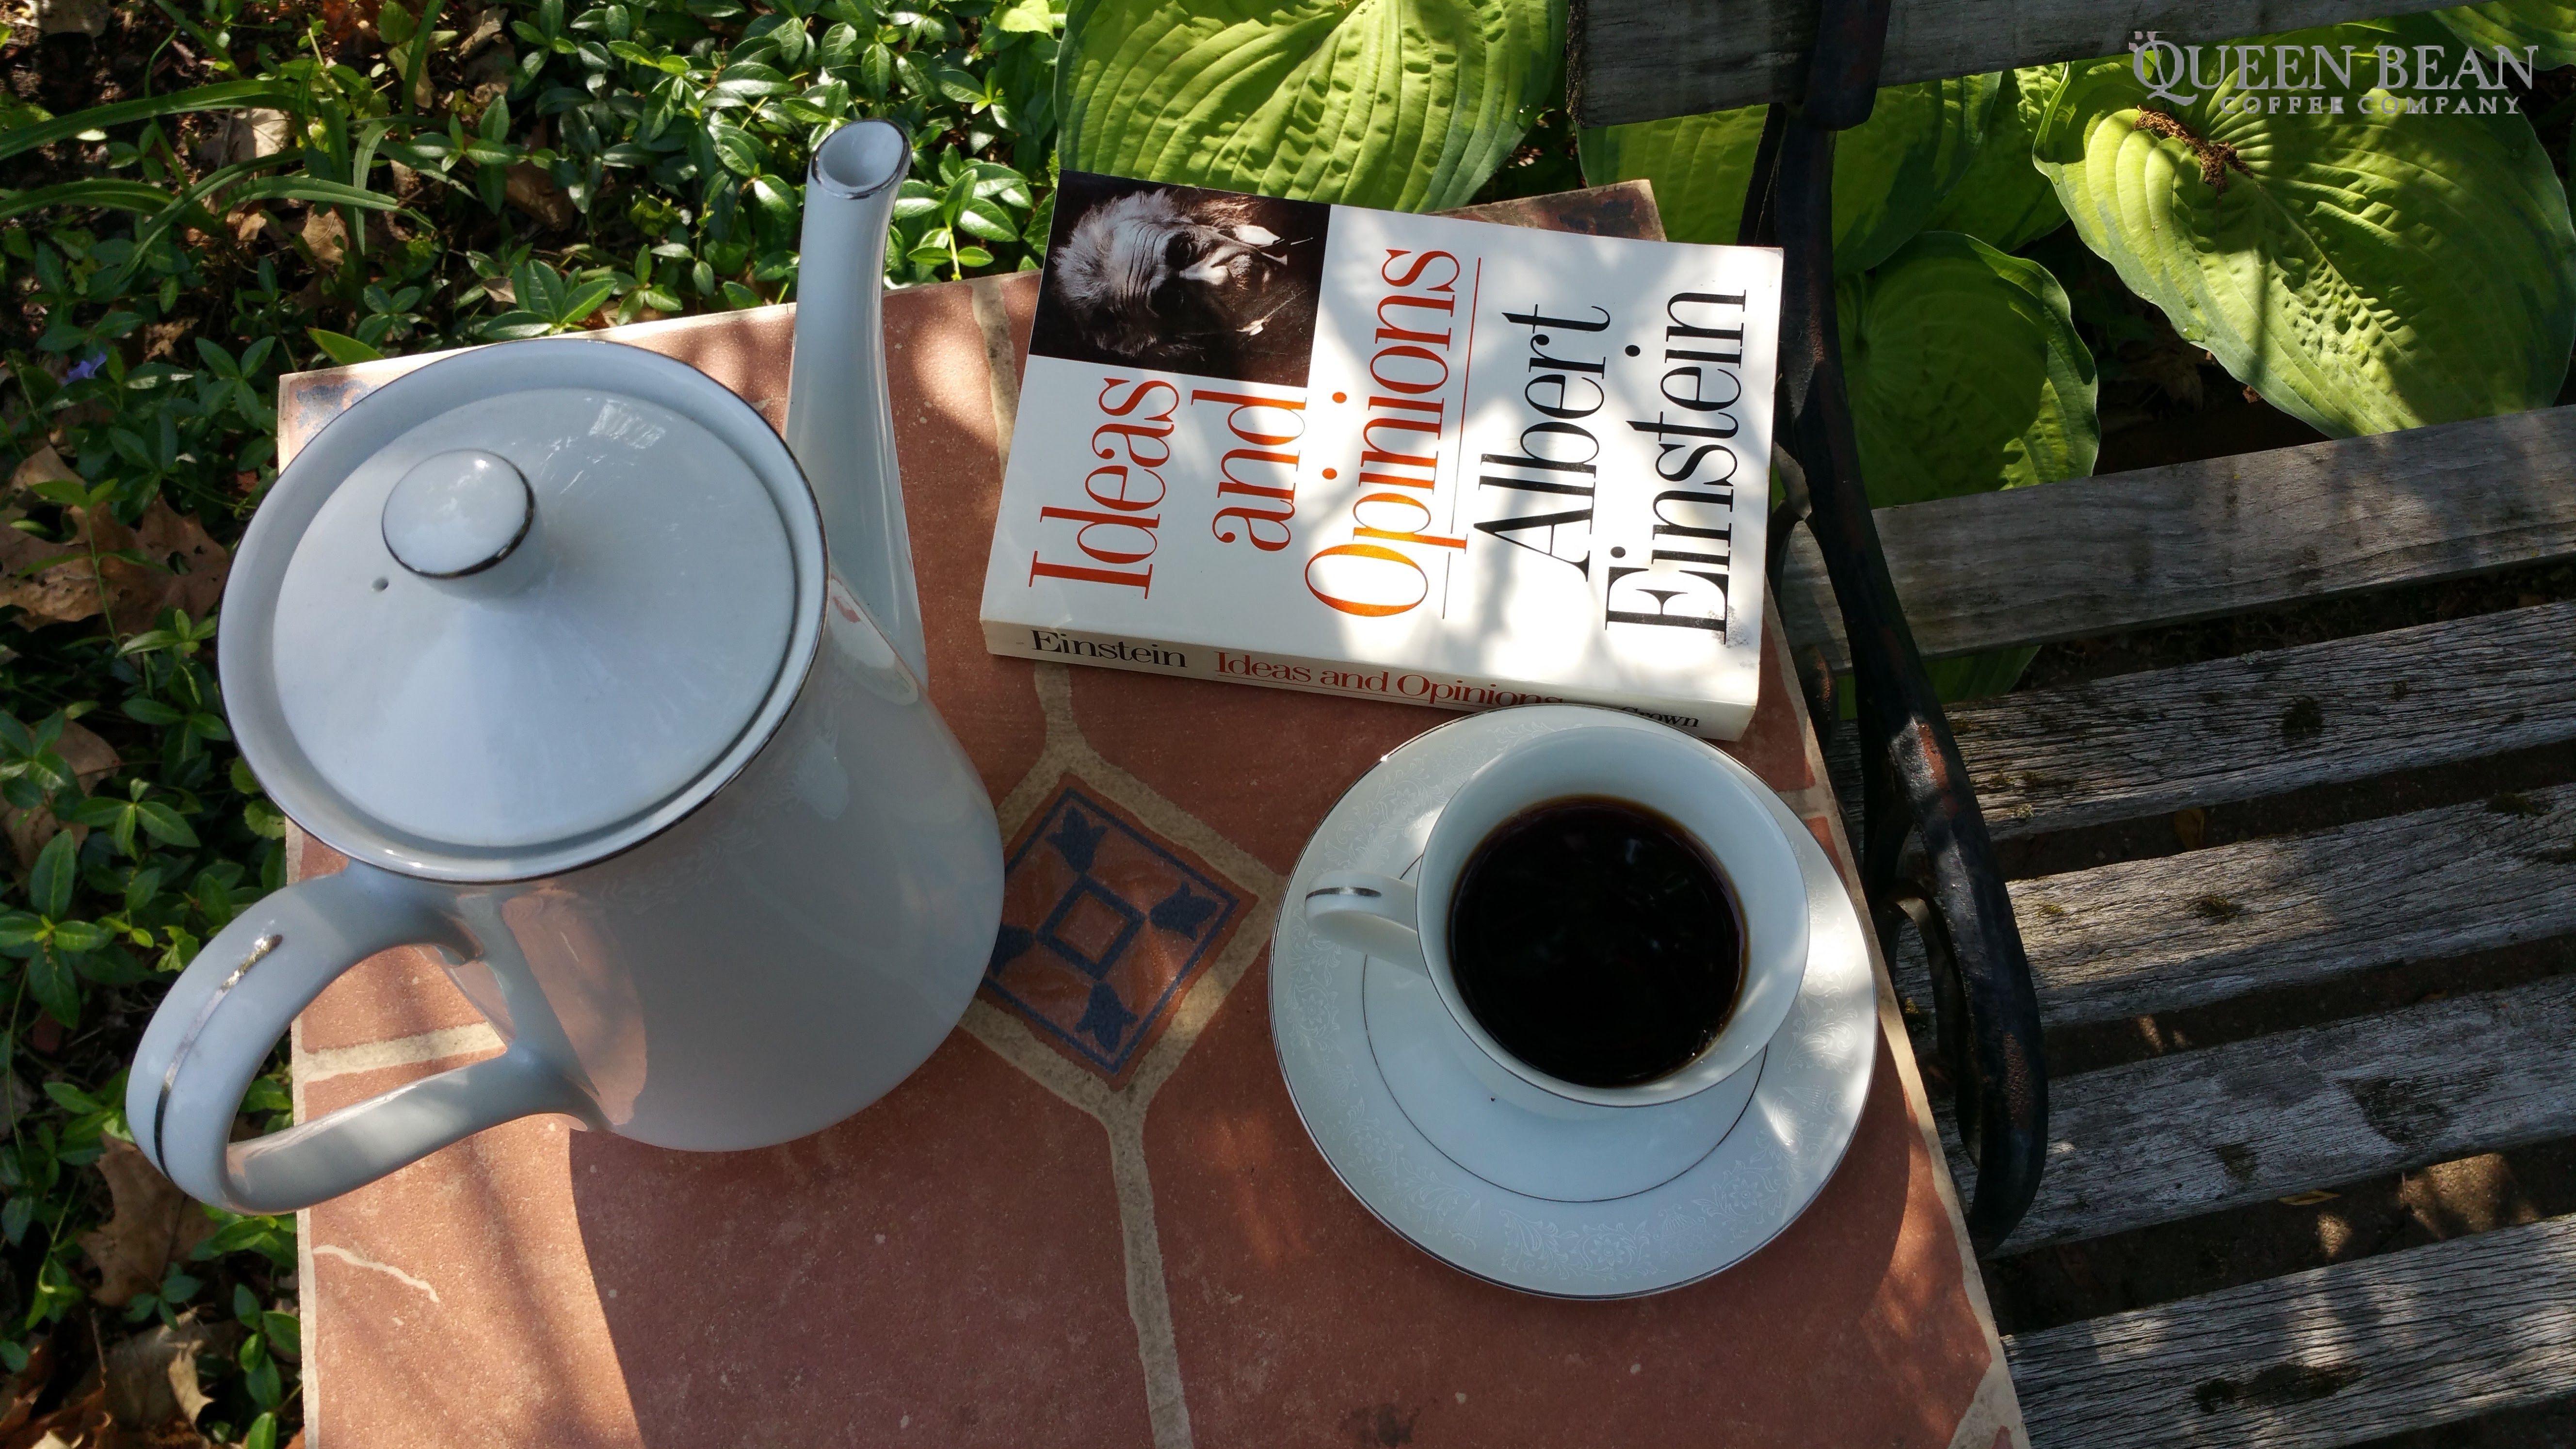 Coffee Einstein Book Reading Urbanparadise Millscoffeeroasting Thequeenbean Coffee Company Coffee Beans